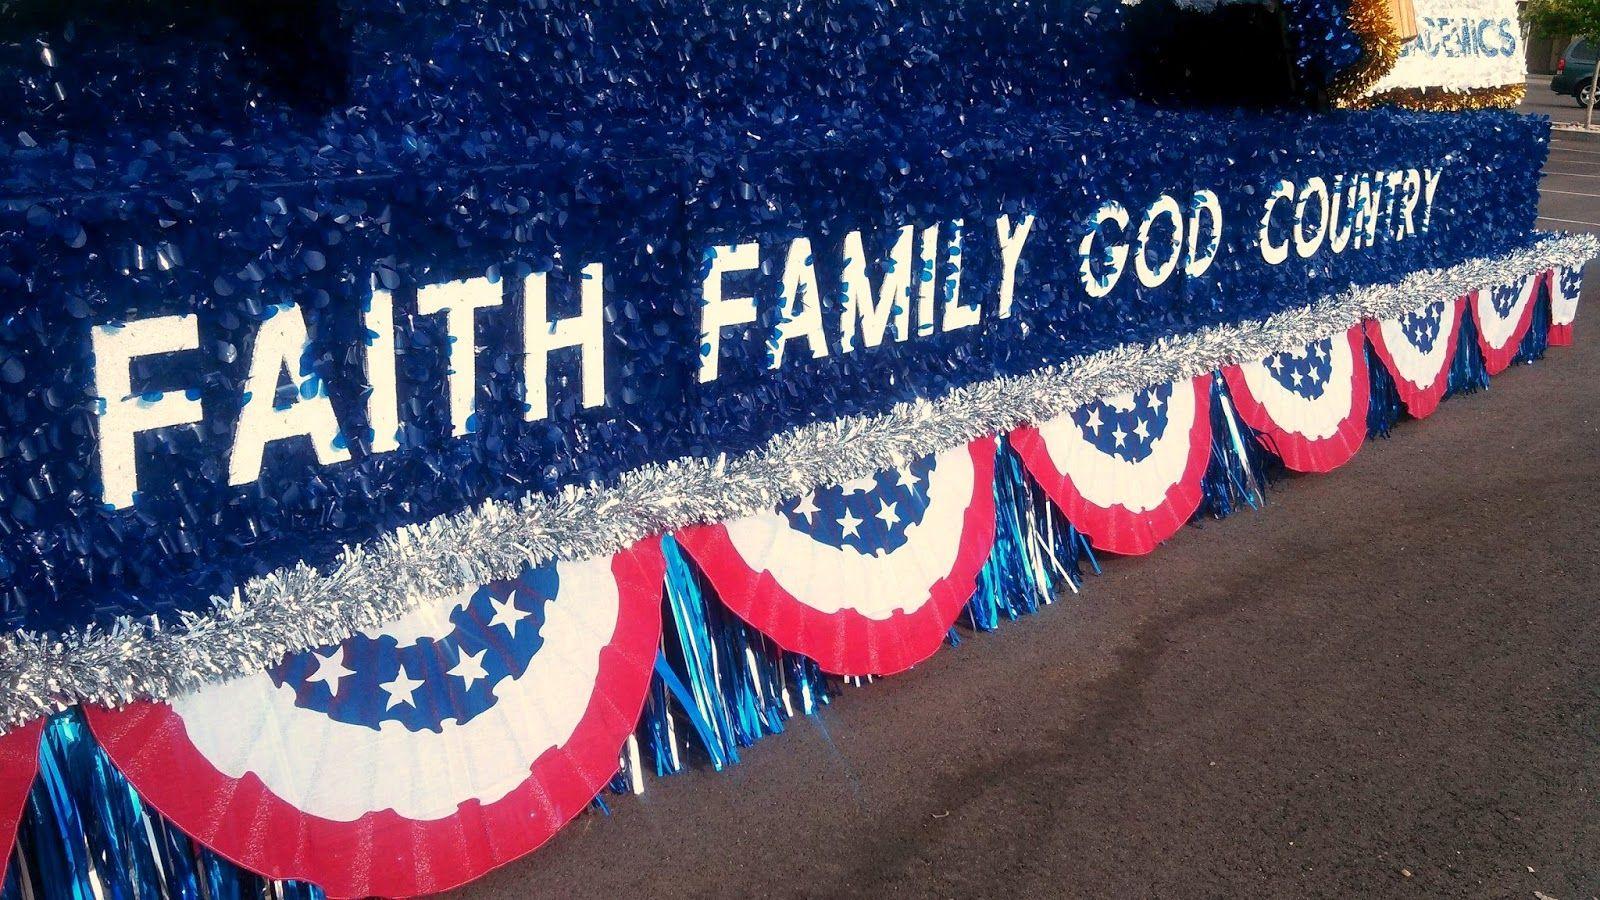 Patriotic Parade Floats Ideas At